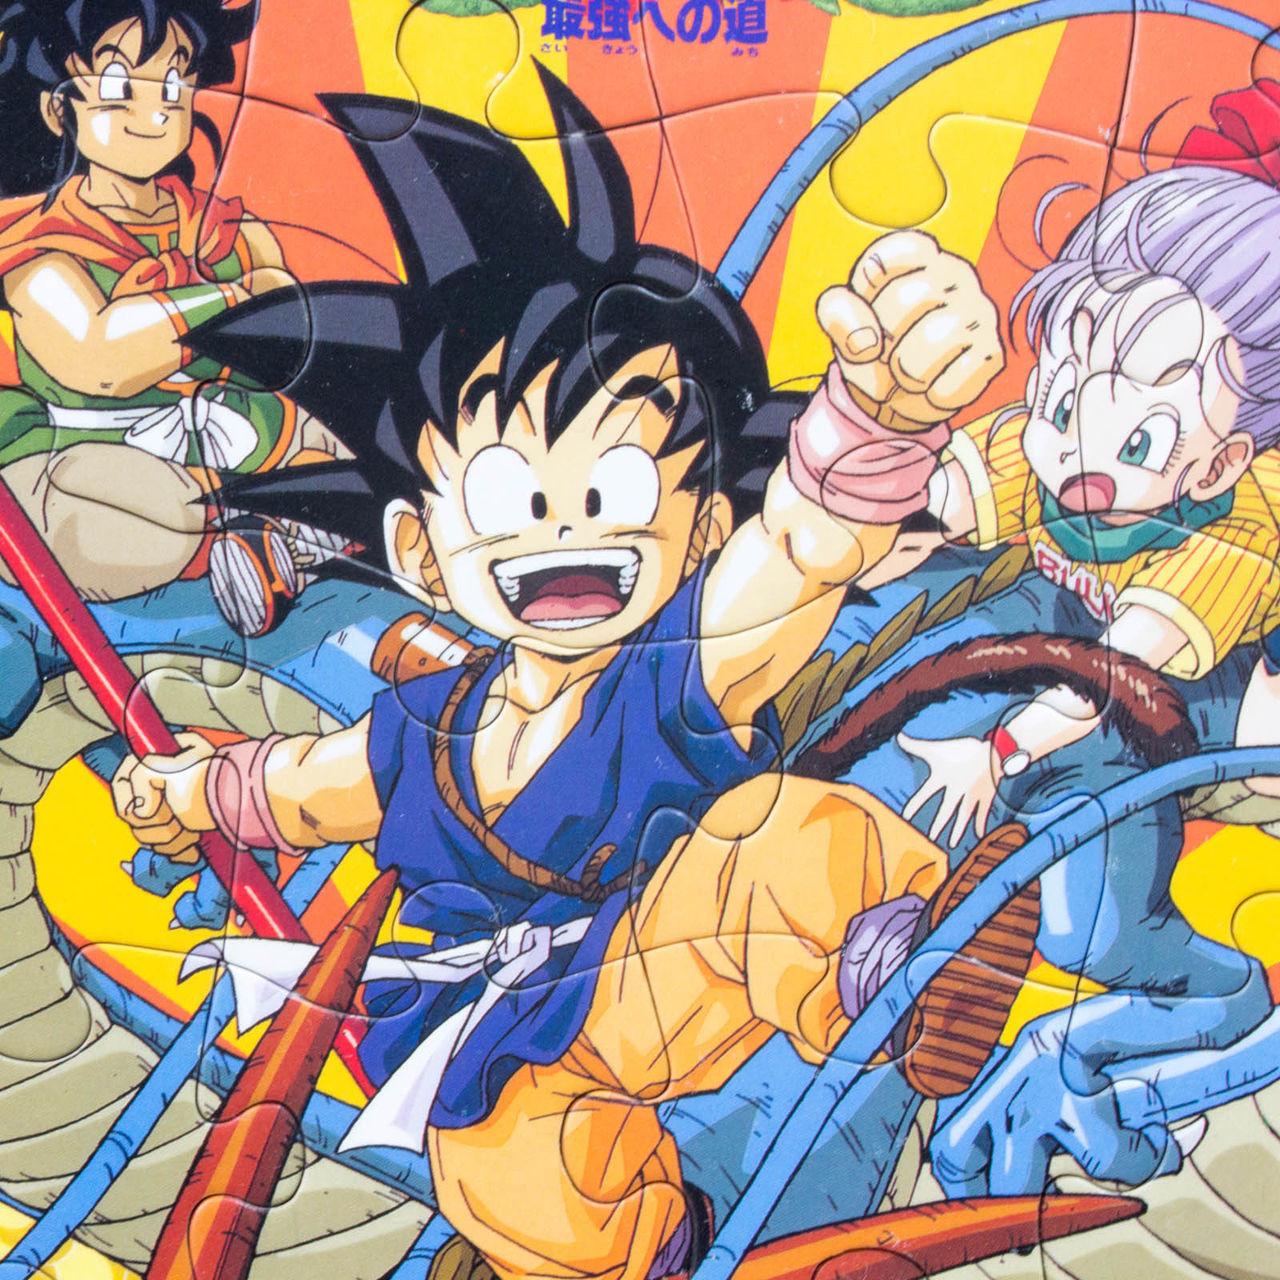 Dragon ball z jigsaw puzzle mcdonalds 1996 japan anime manga